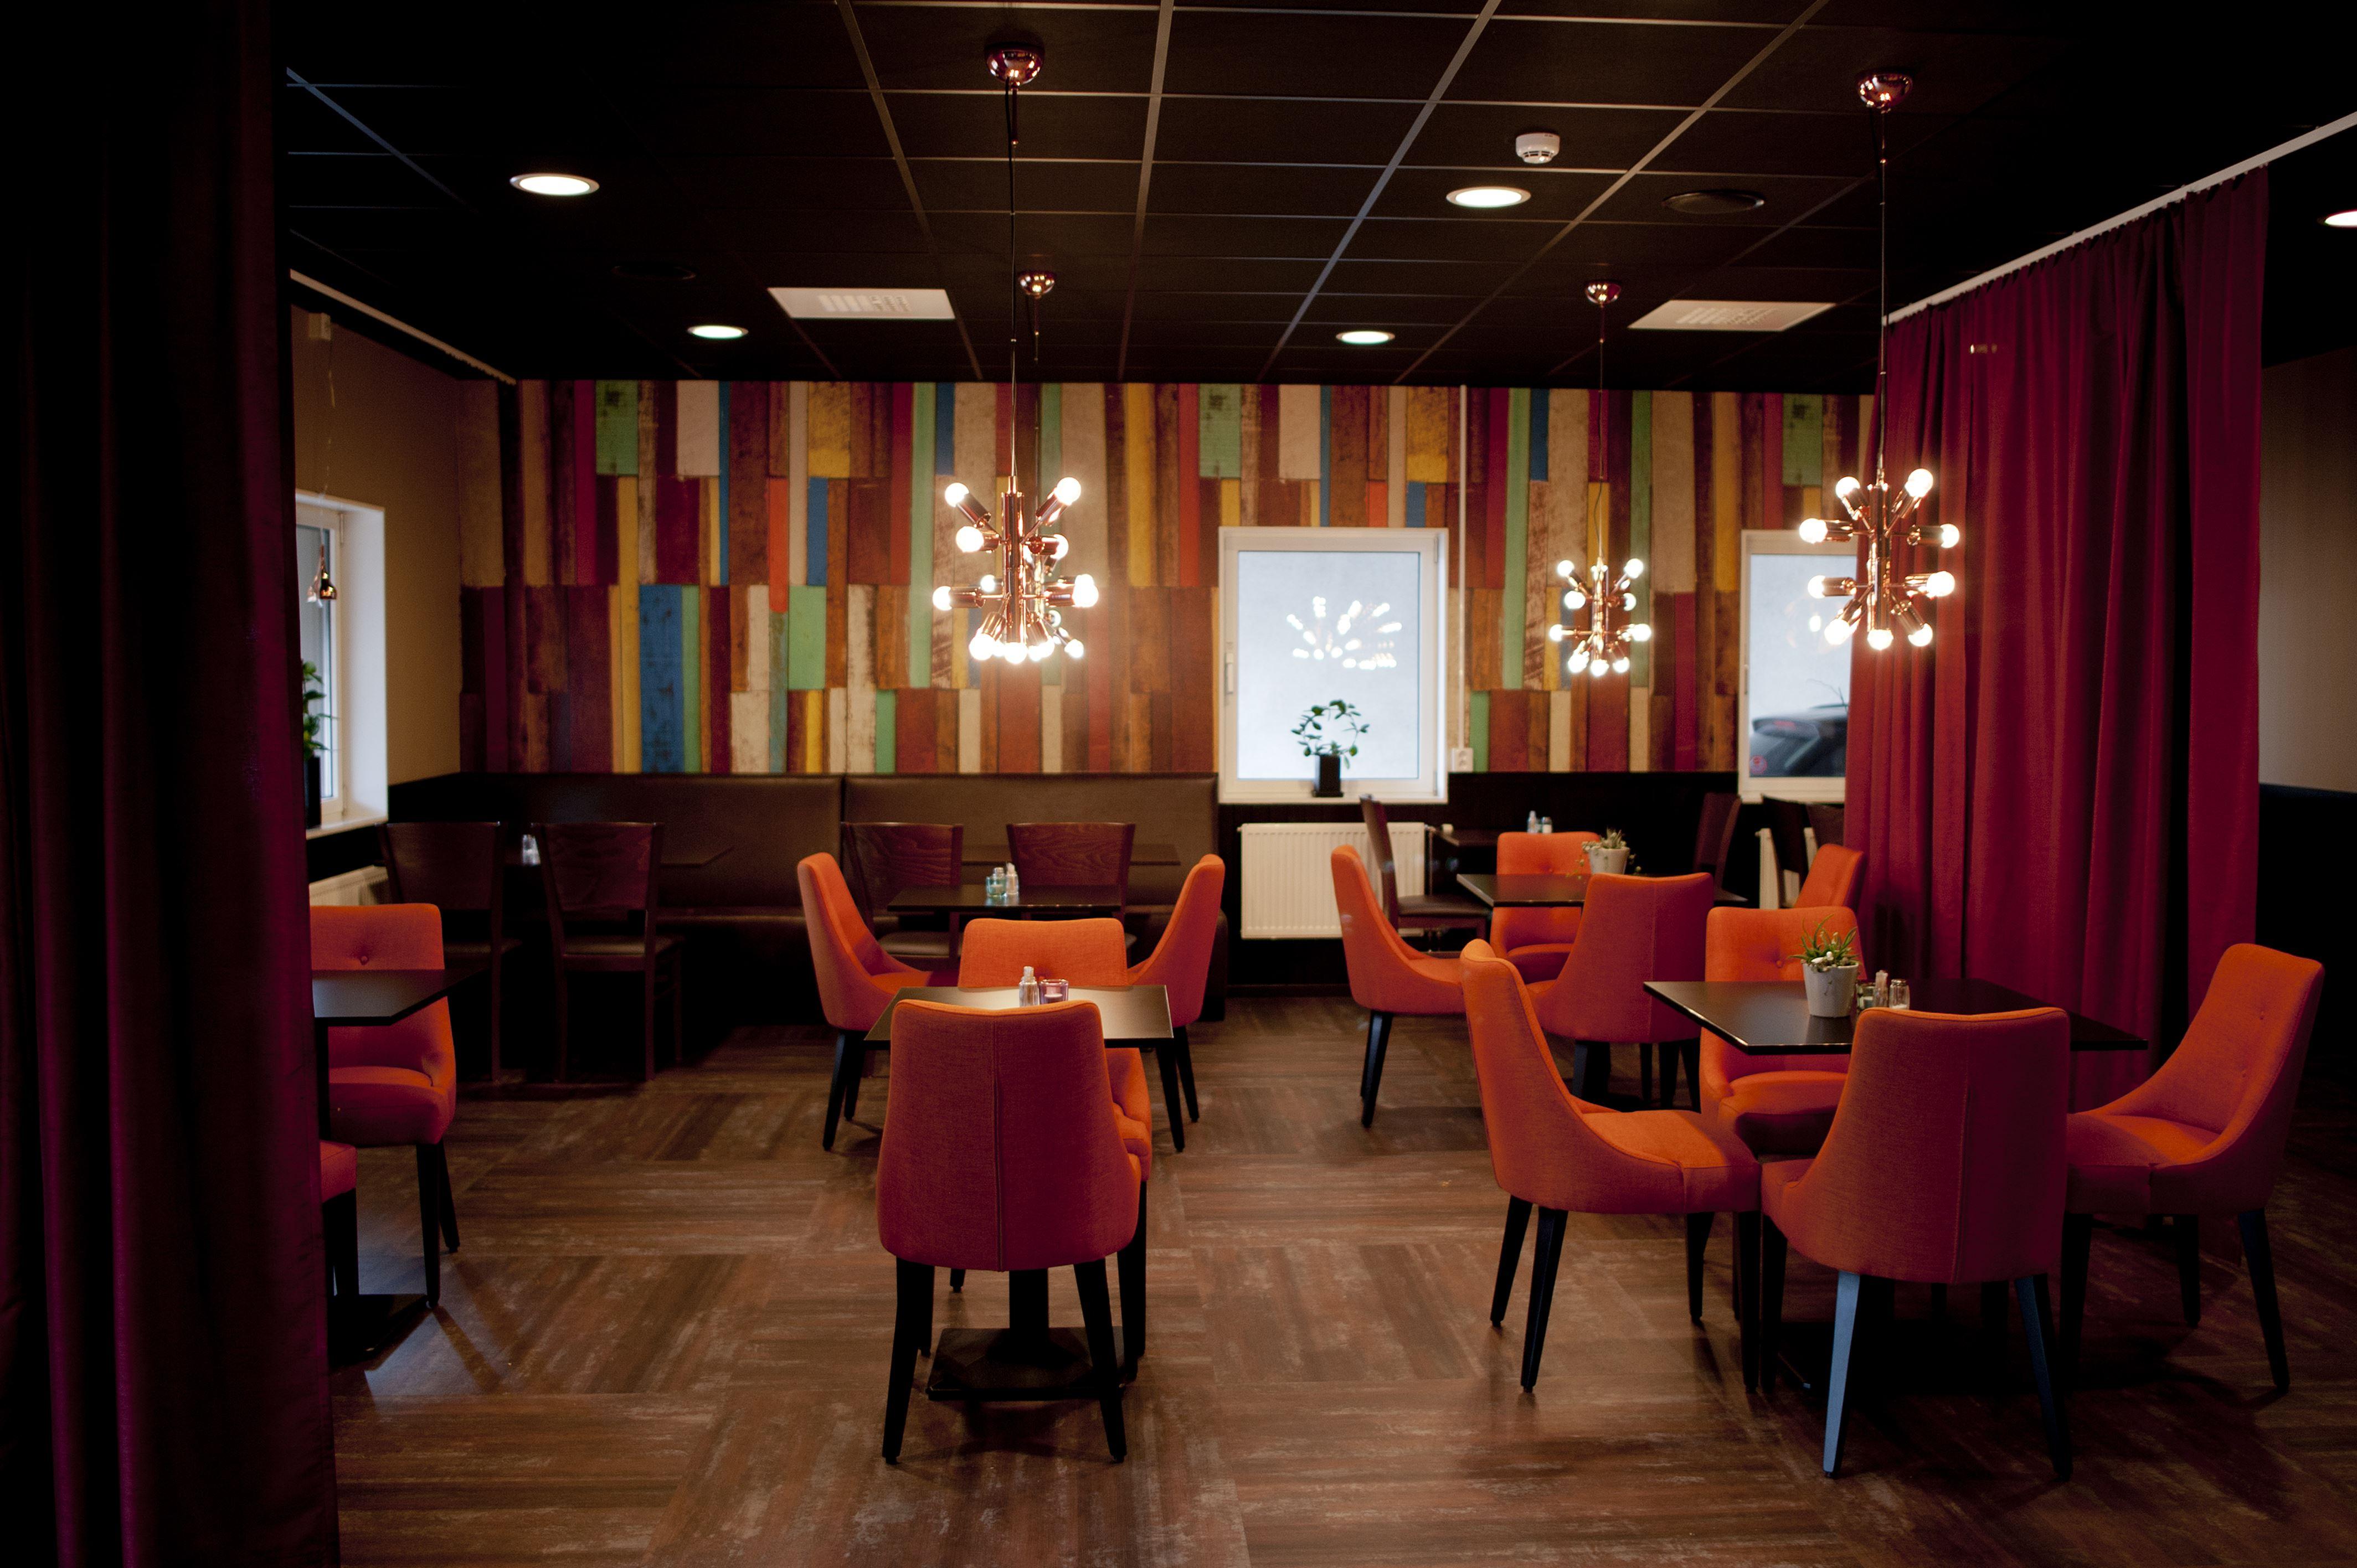 © Centralhotellet, Centralhotellet Beers & Burgers